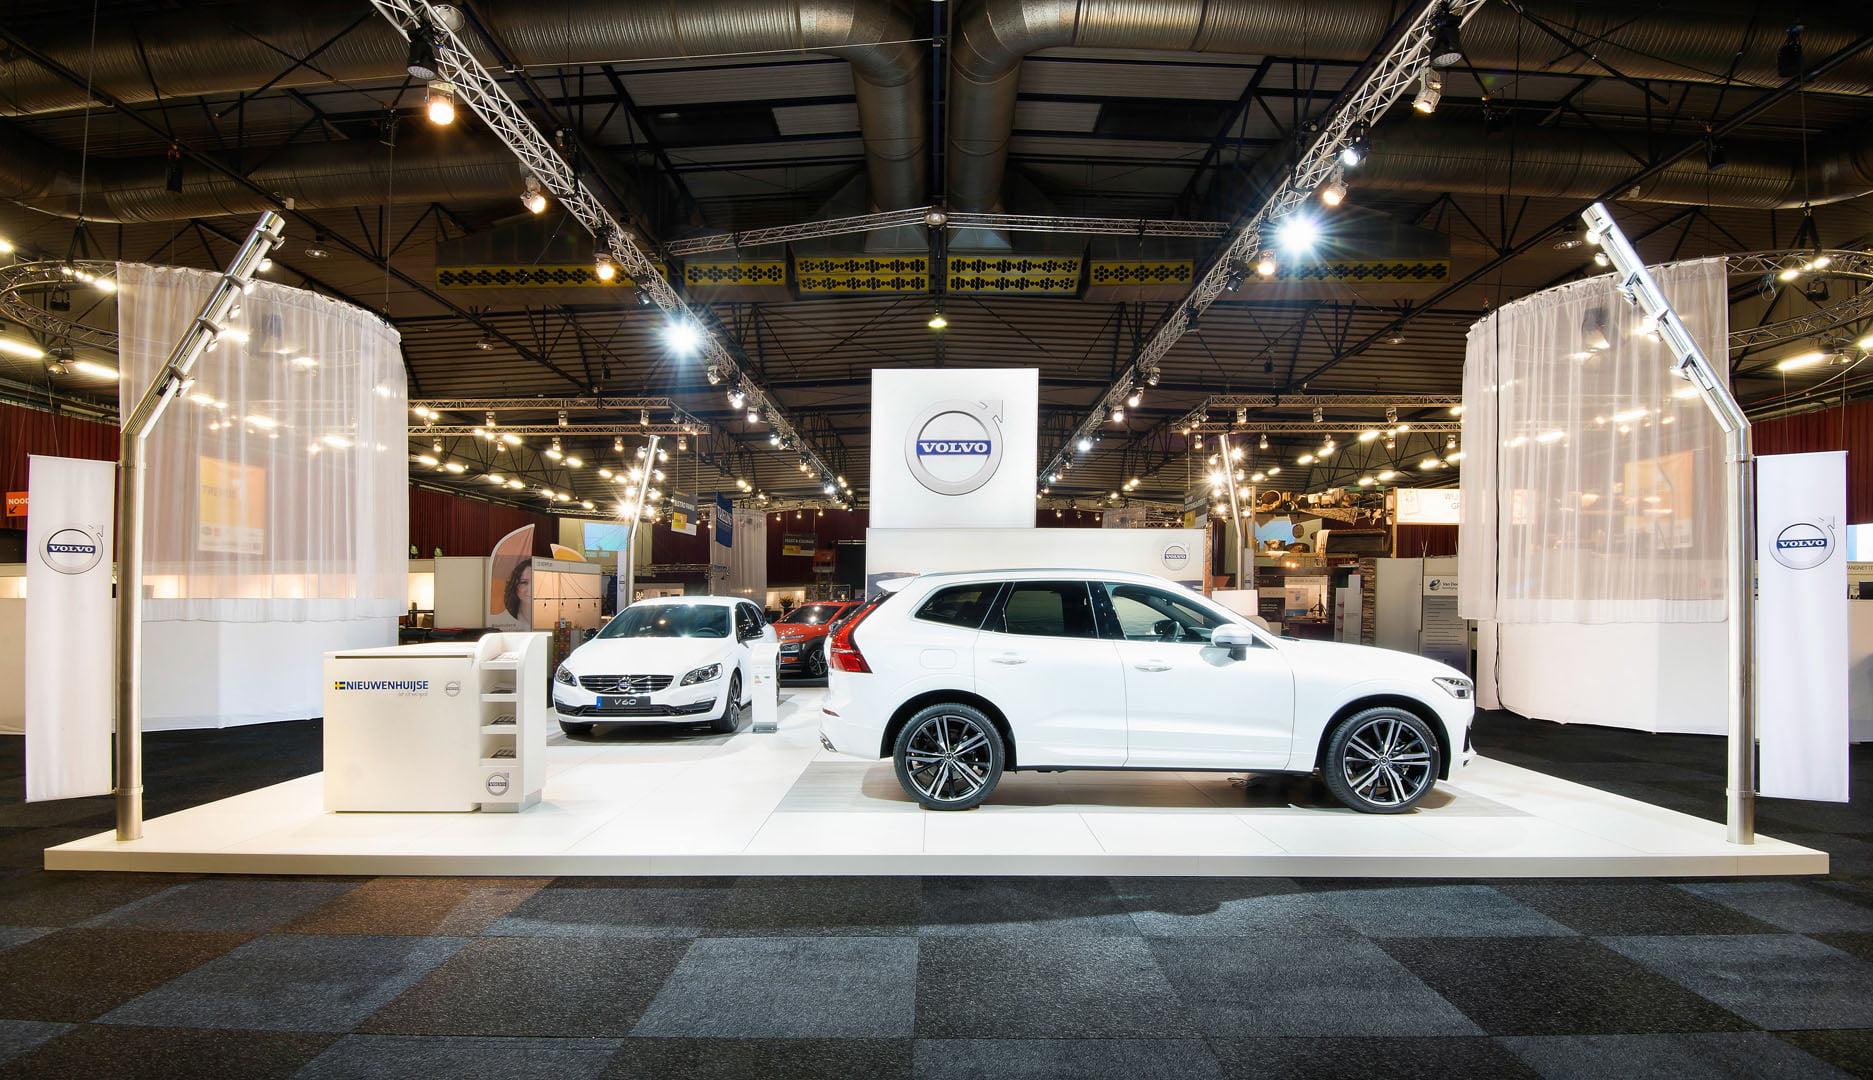 17-3263 Volvo - Wit Design